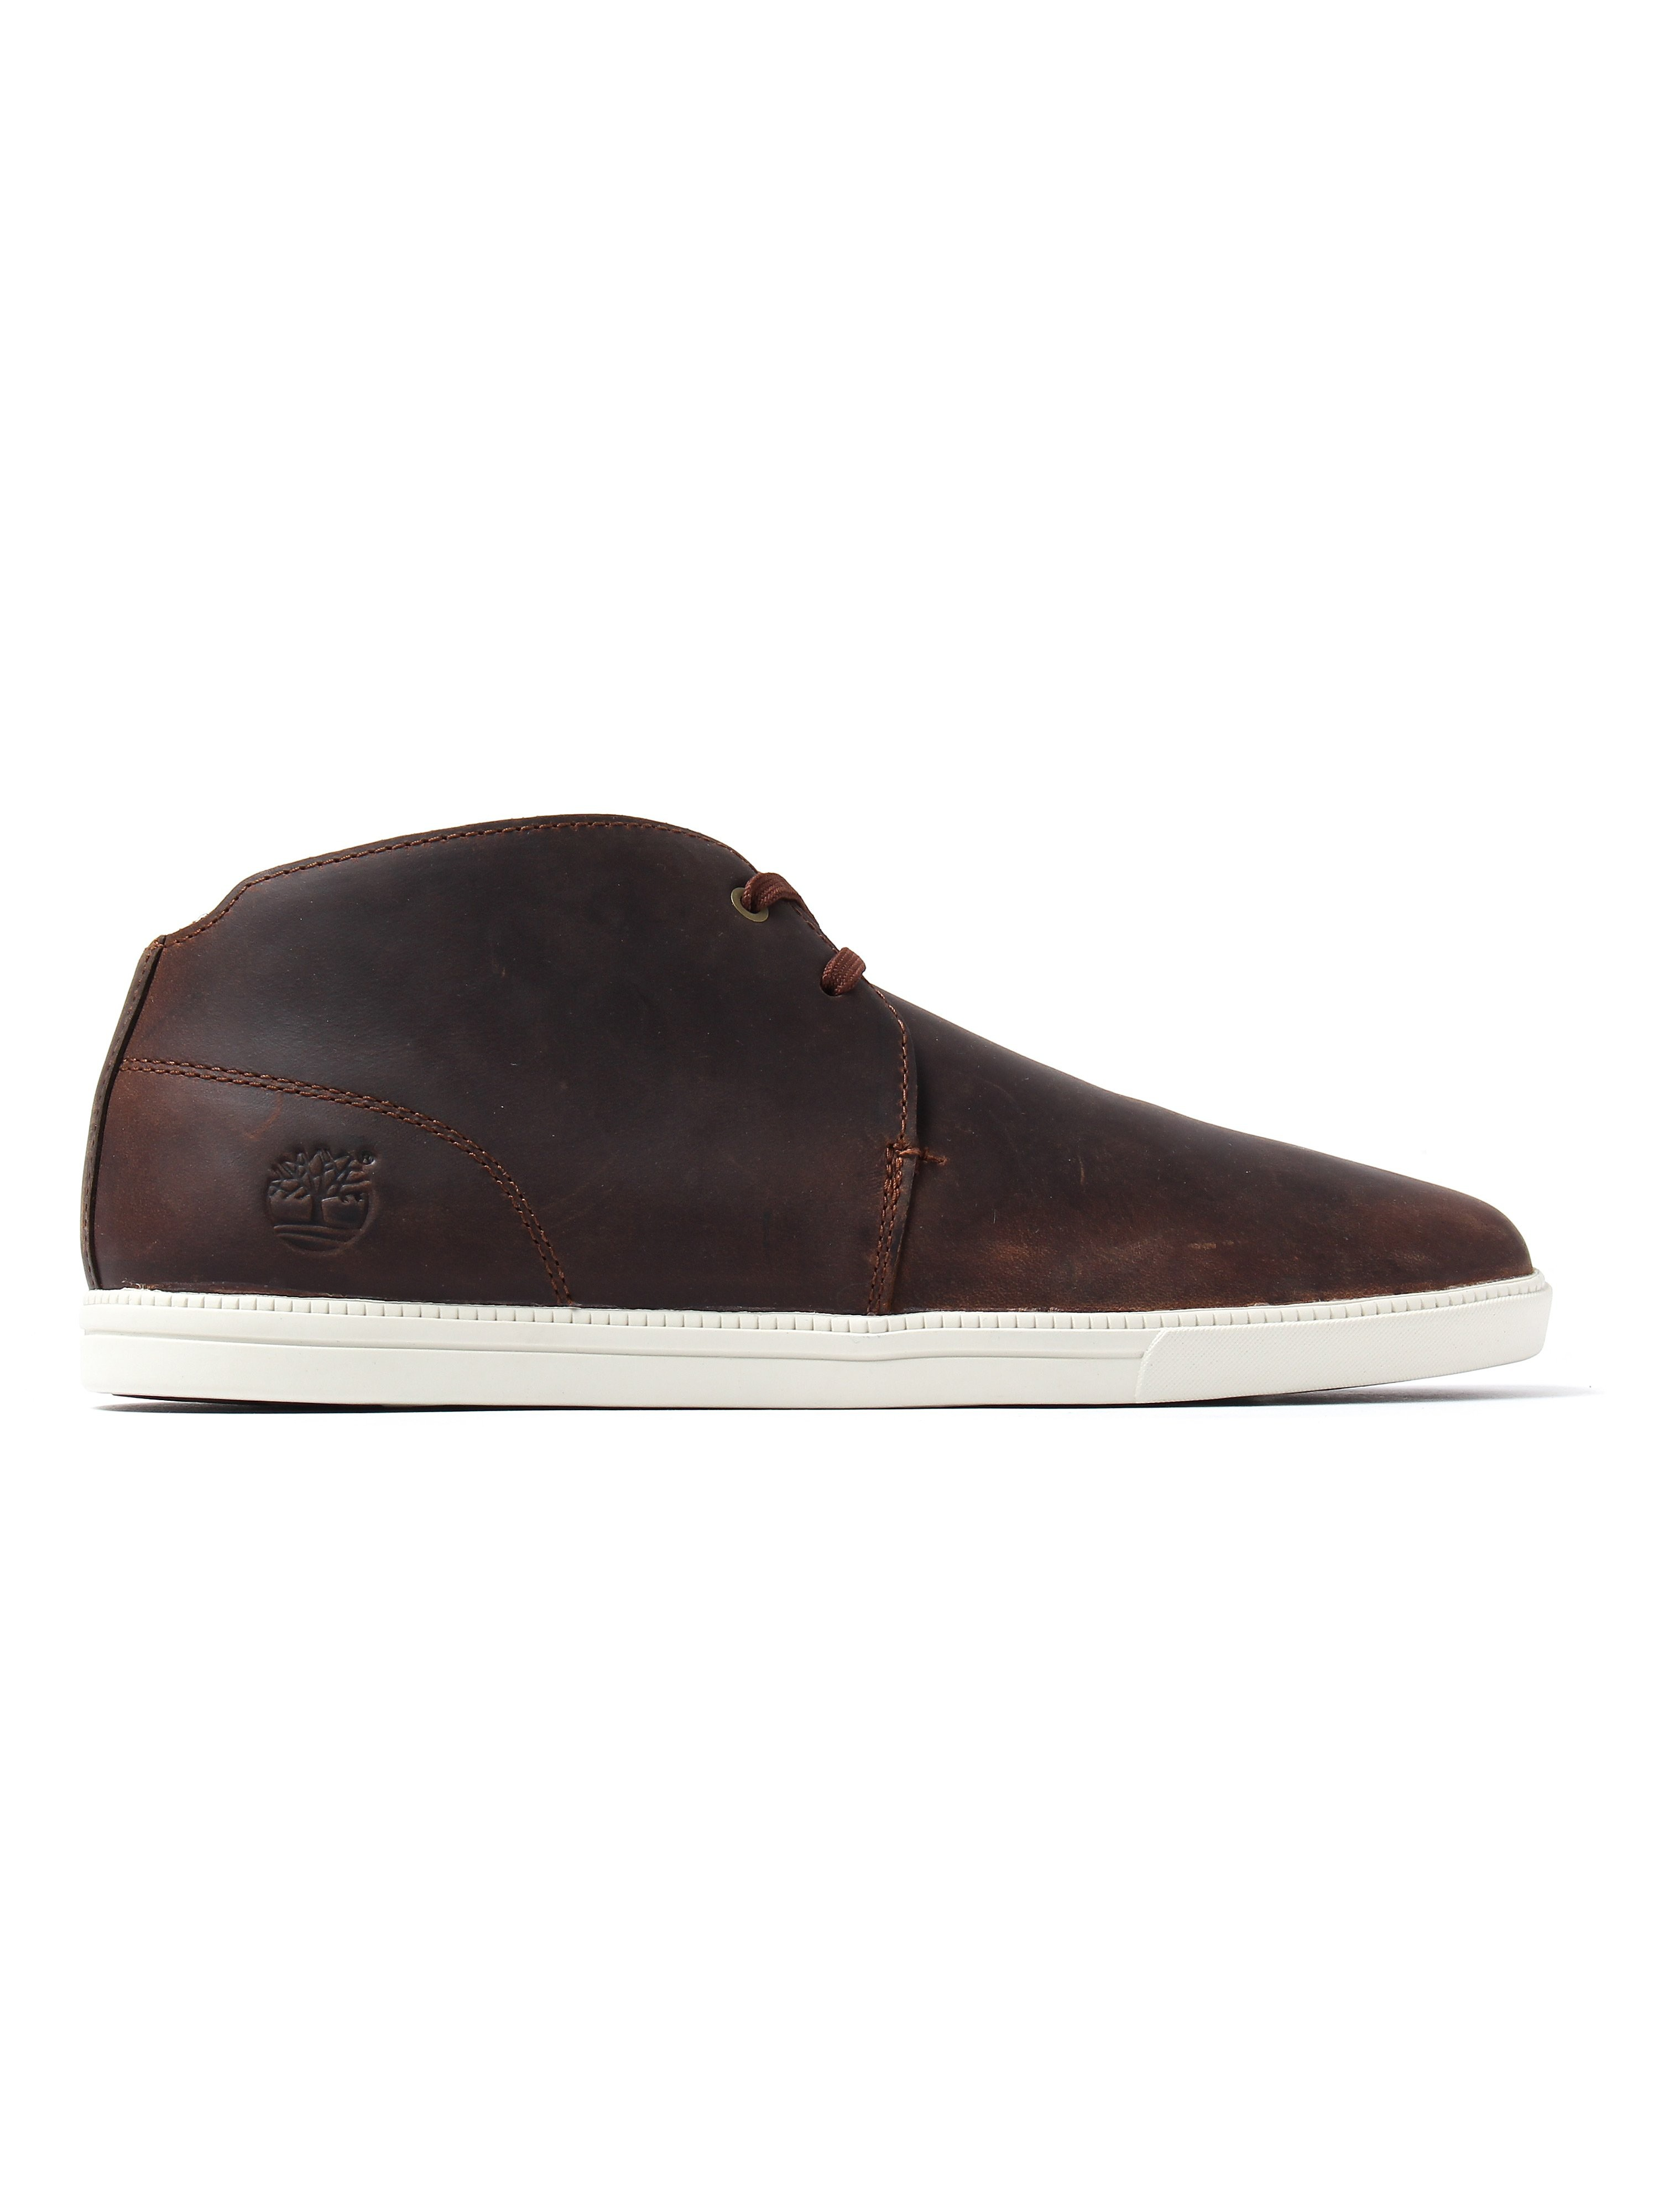 Timberland Men's Fulk LP Mid Desert Boots - Gaucho Leather